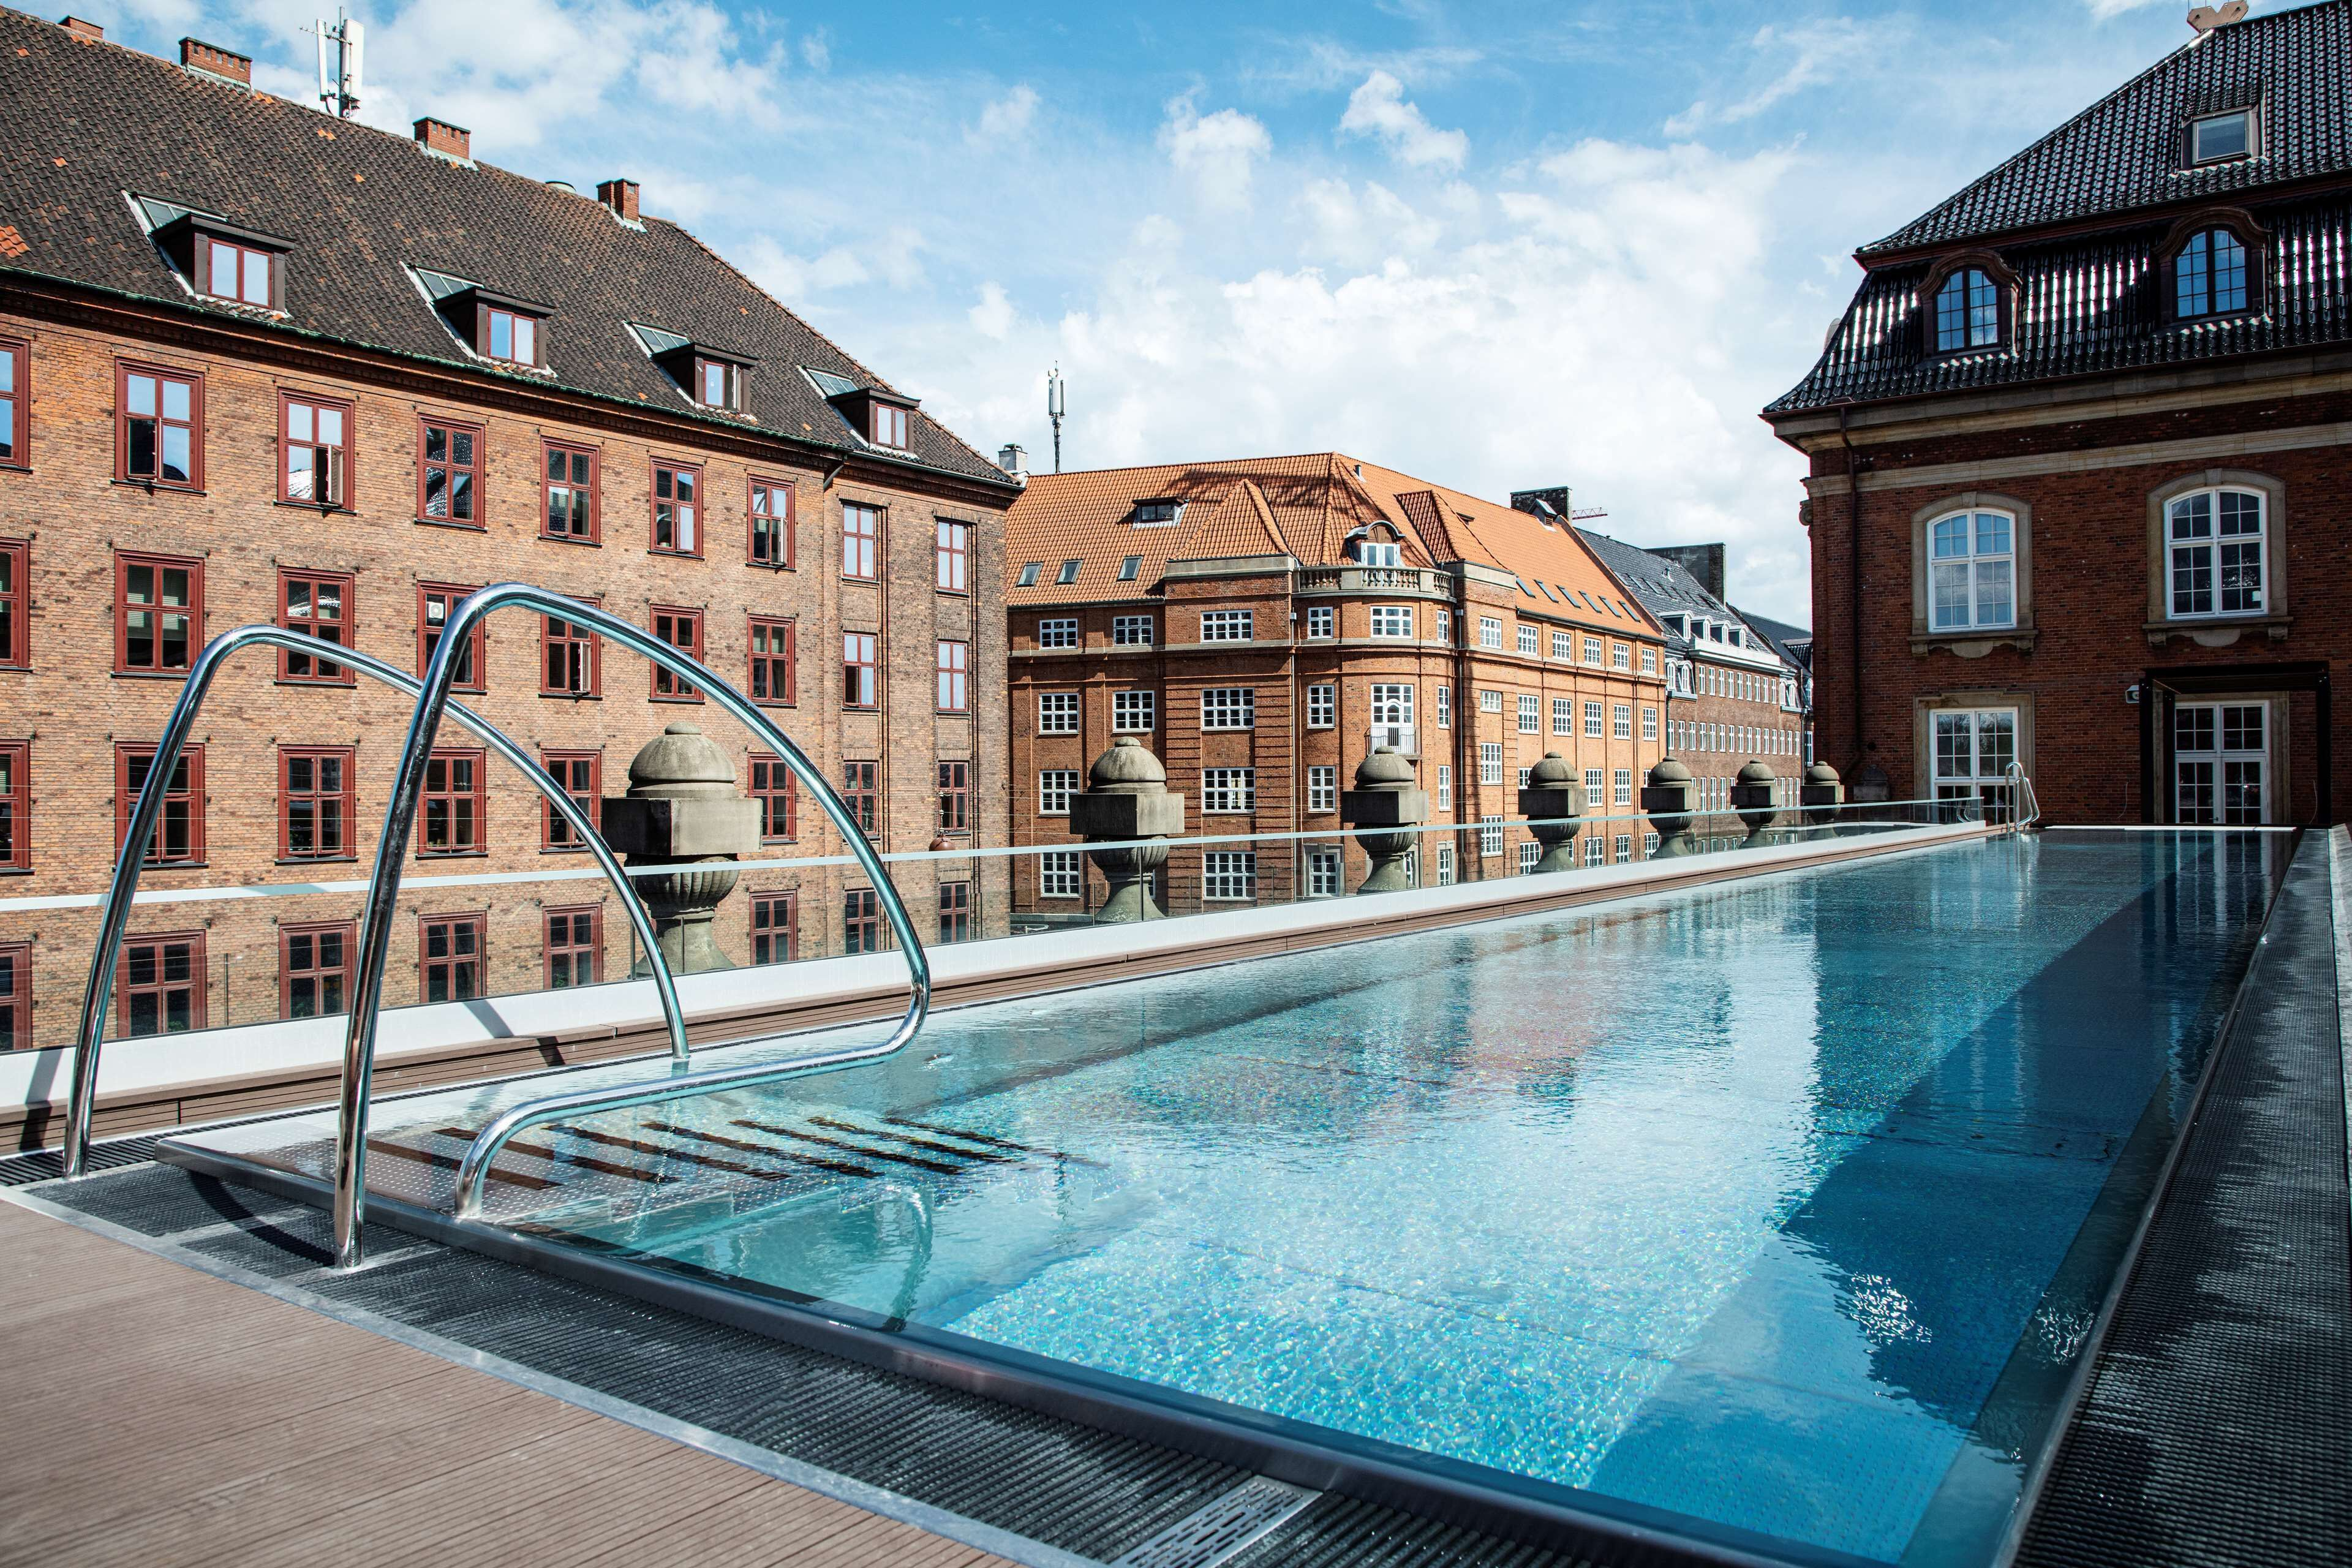 Courtesy of Villa Copenhagen Hotel / Expedia.com